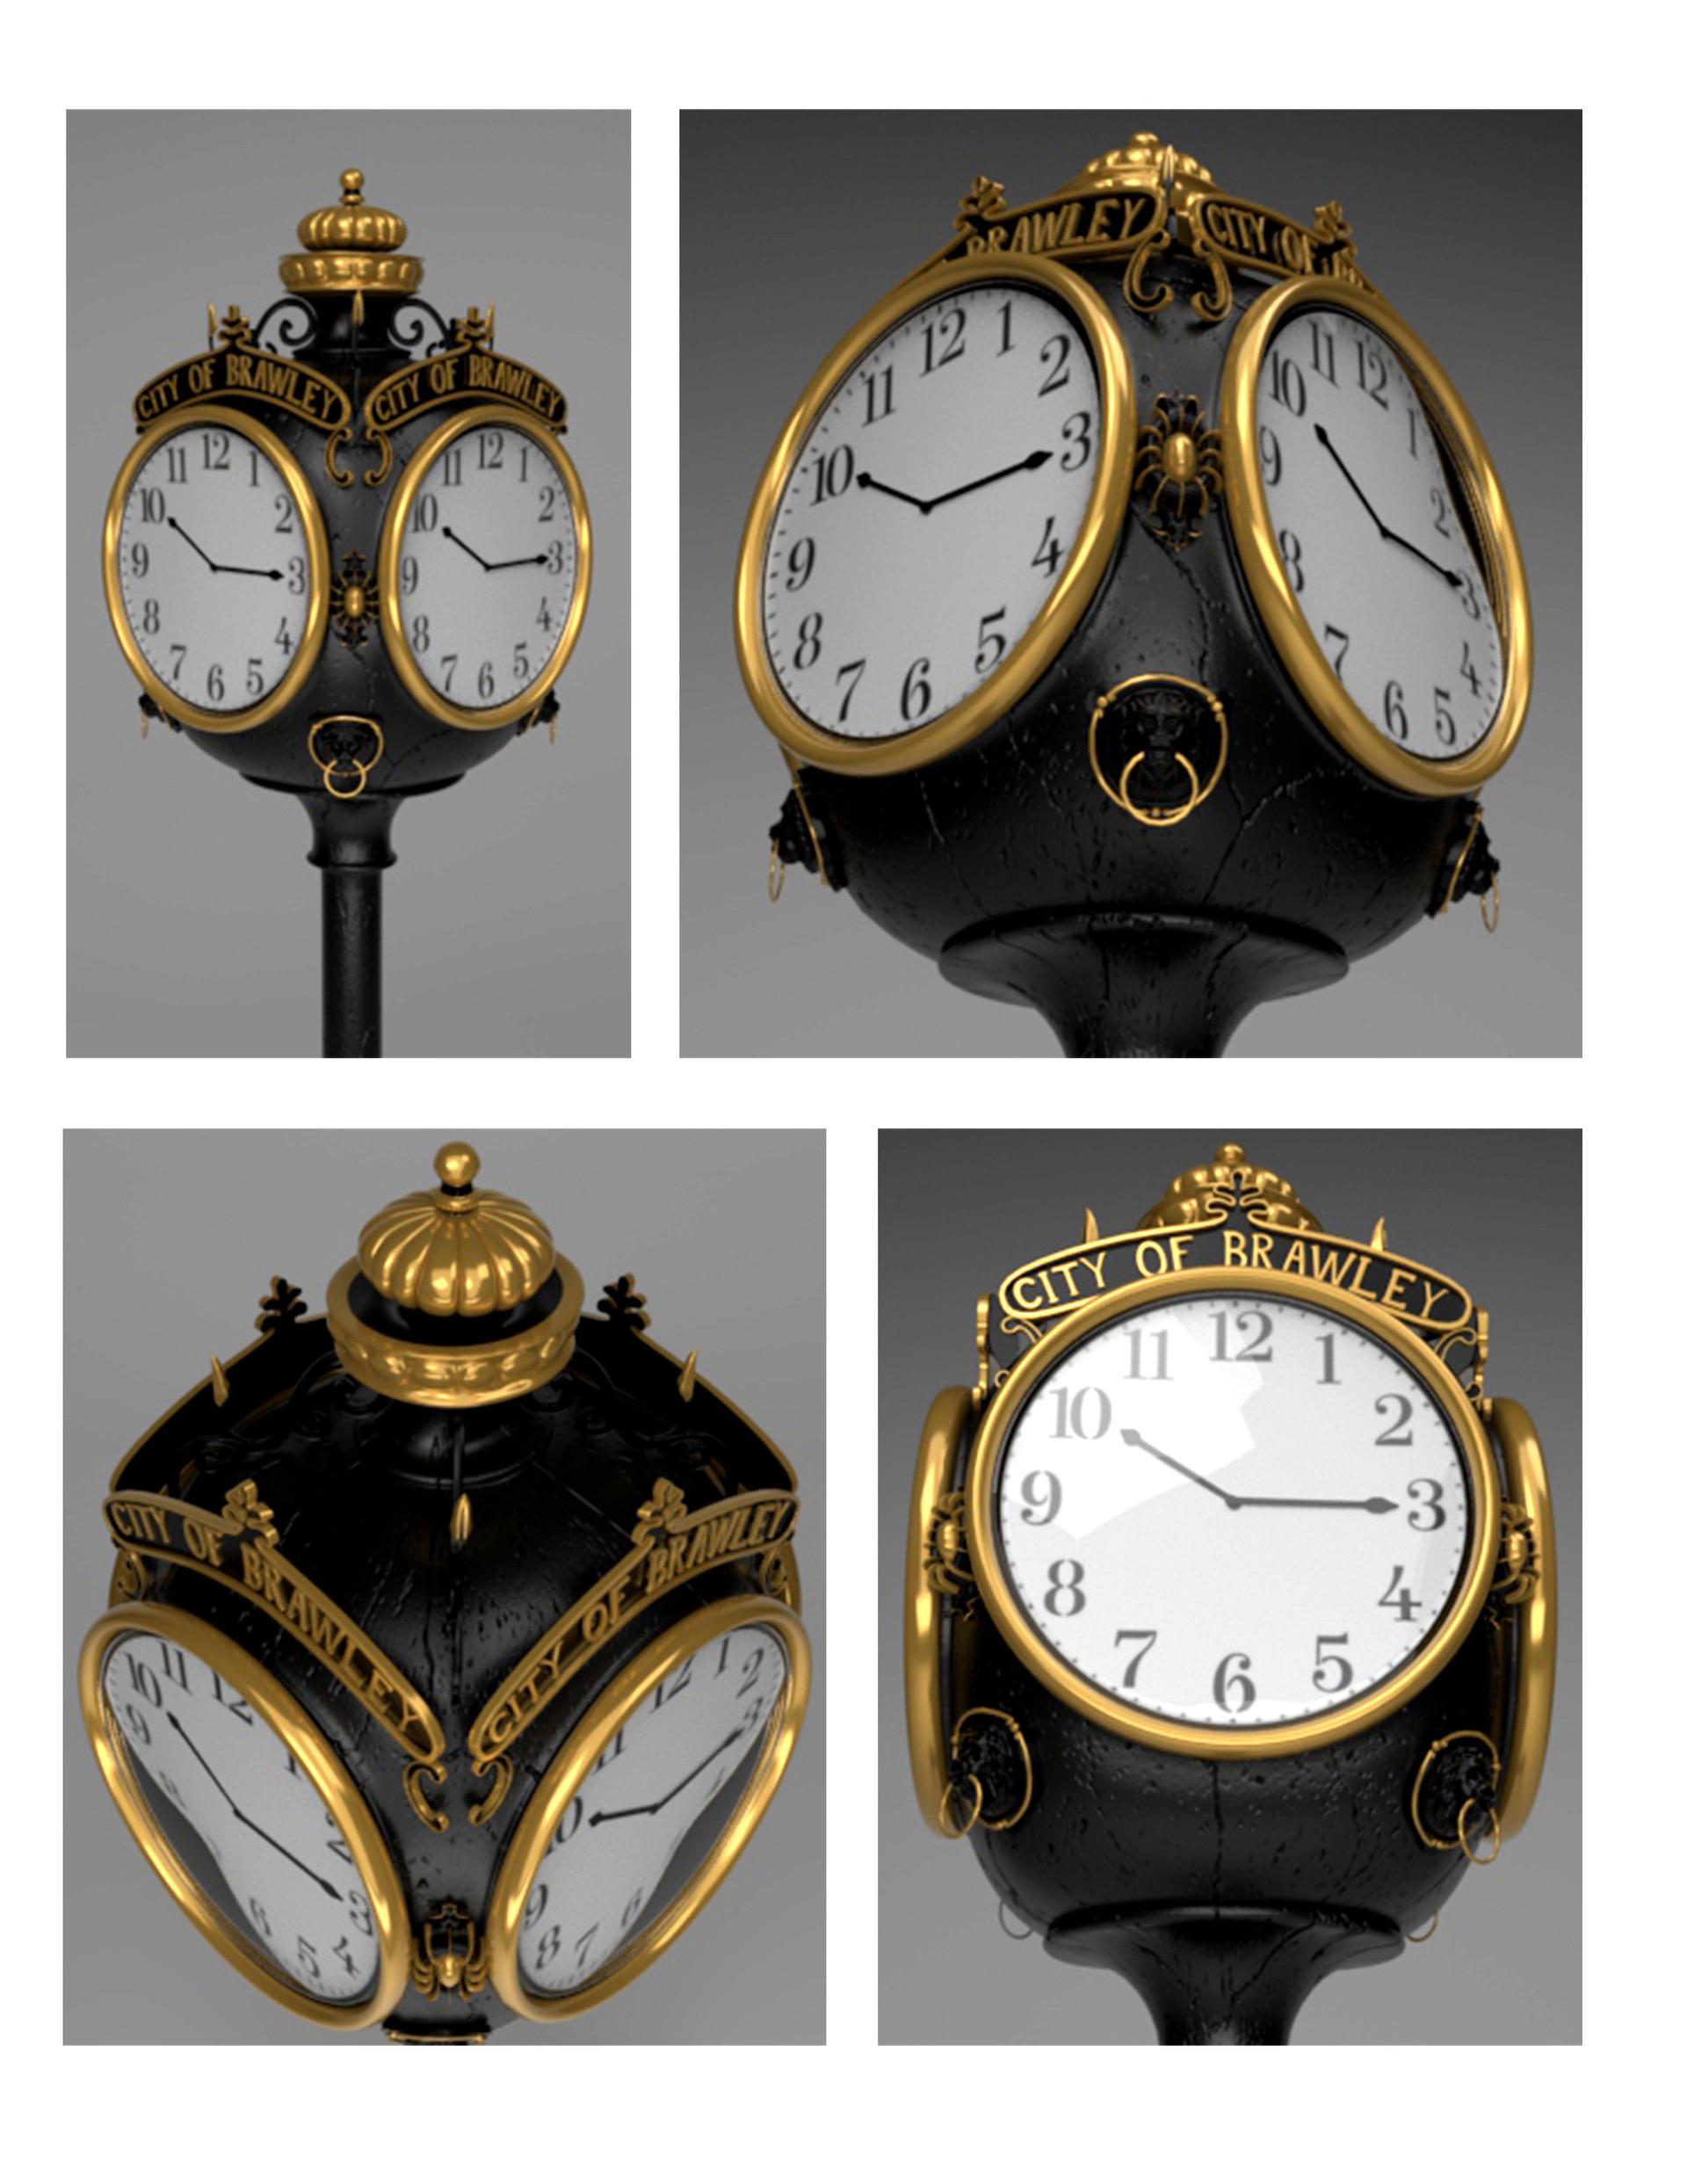 ArtStation - Street Clock, Megan McDonough